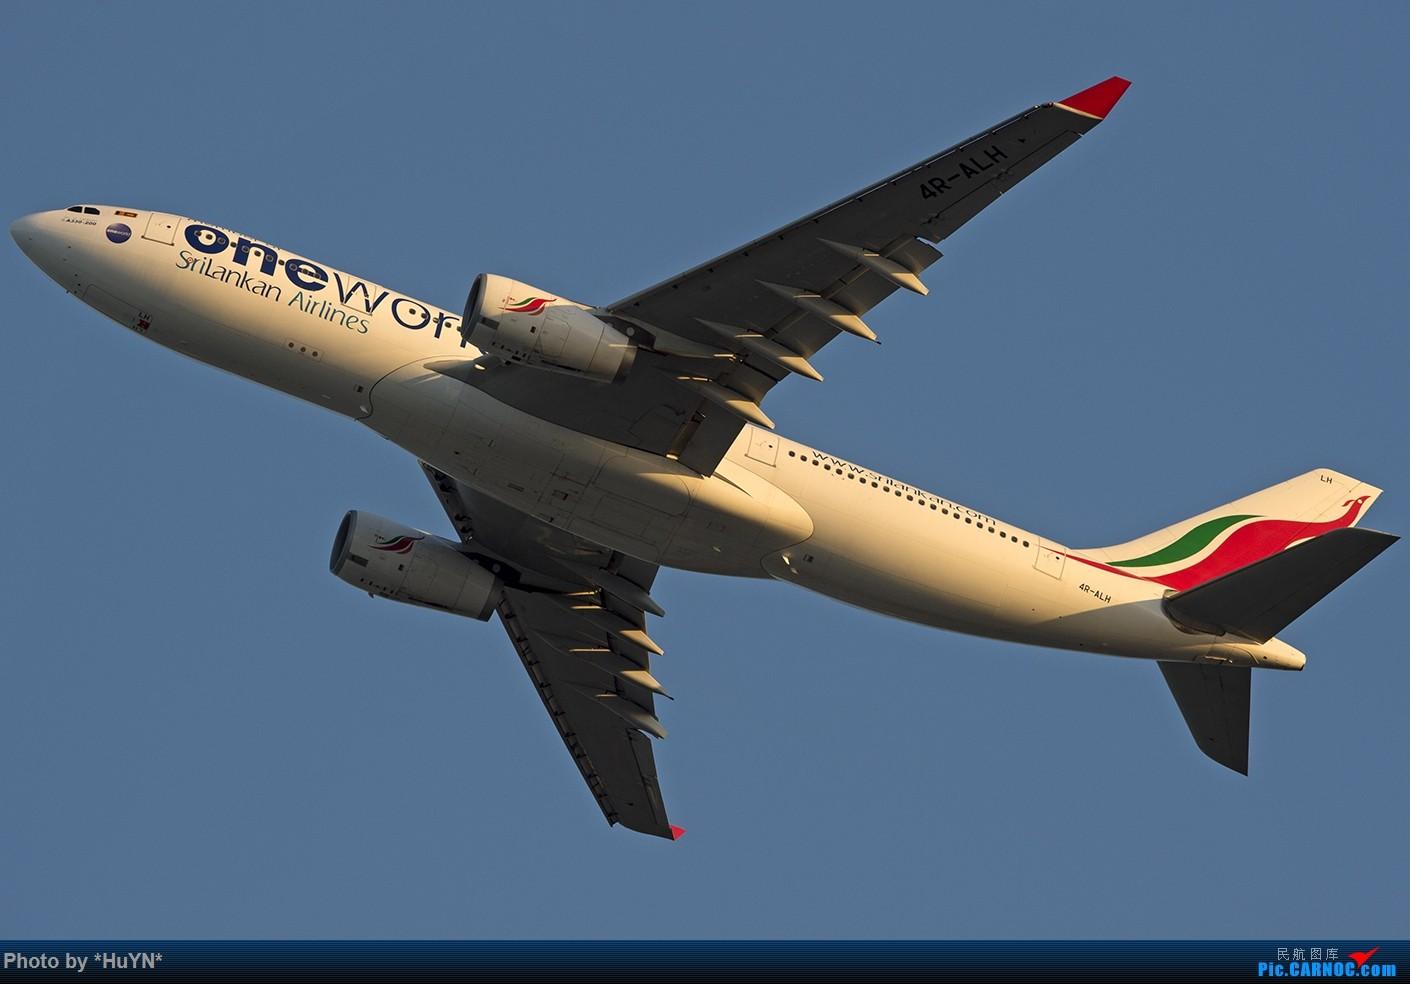 Re:[原创]听说又能审图了我也试试之二 AIRBUS A330-200 4R-ALH 中国香港赤鱲角国际机场